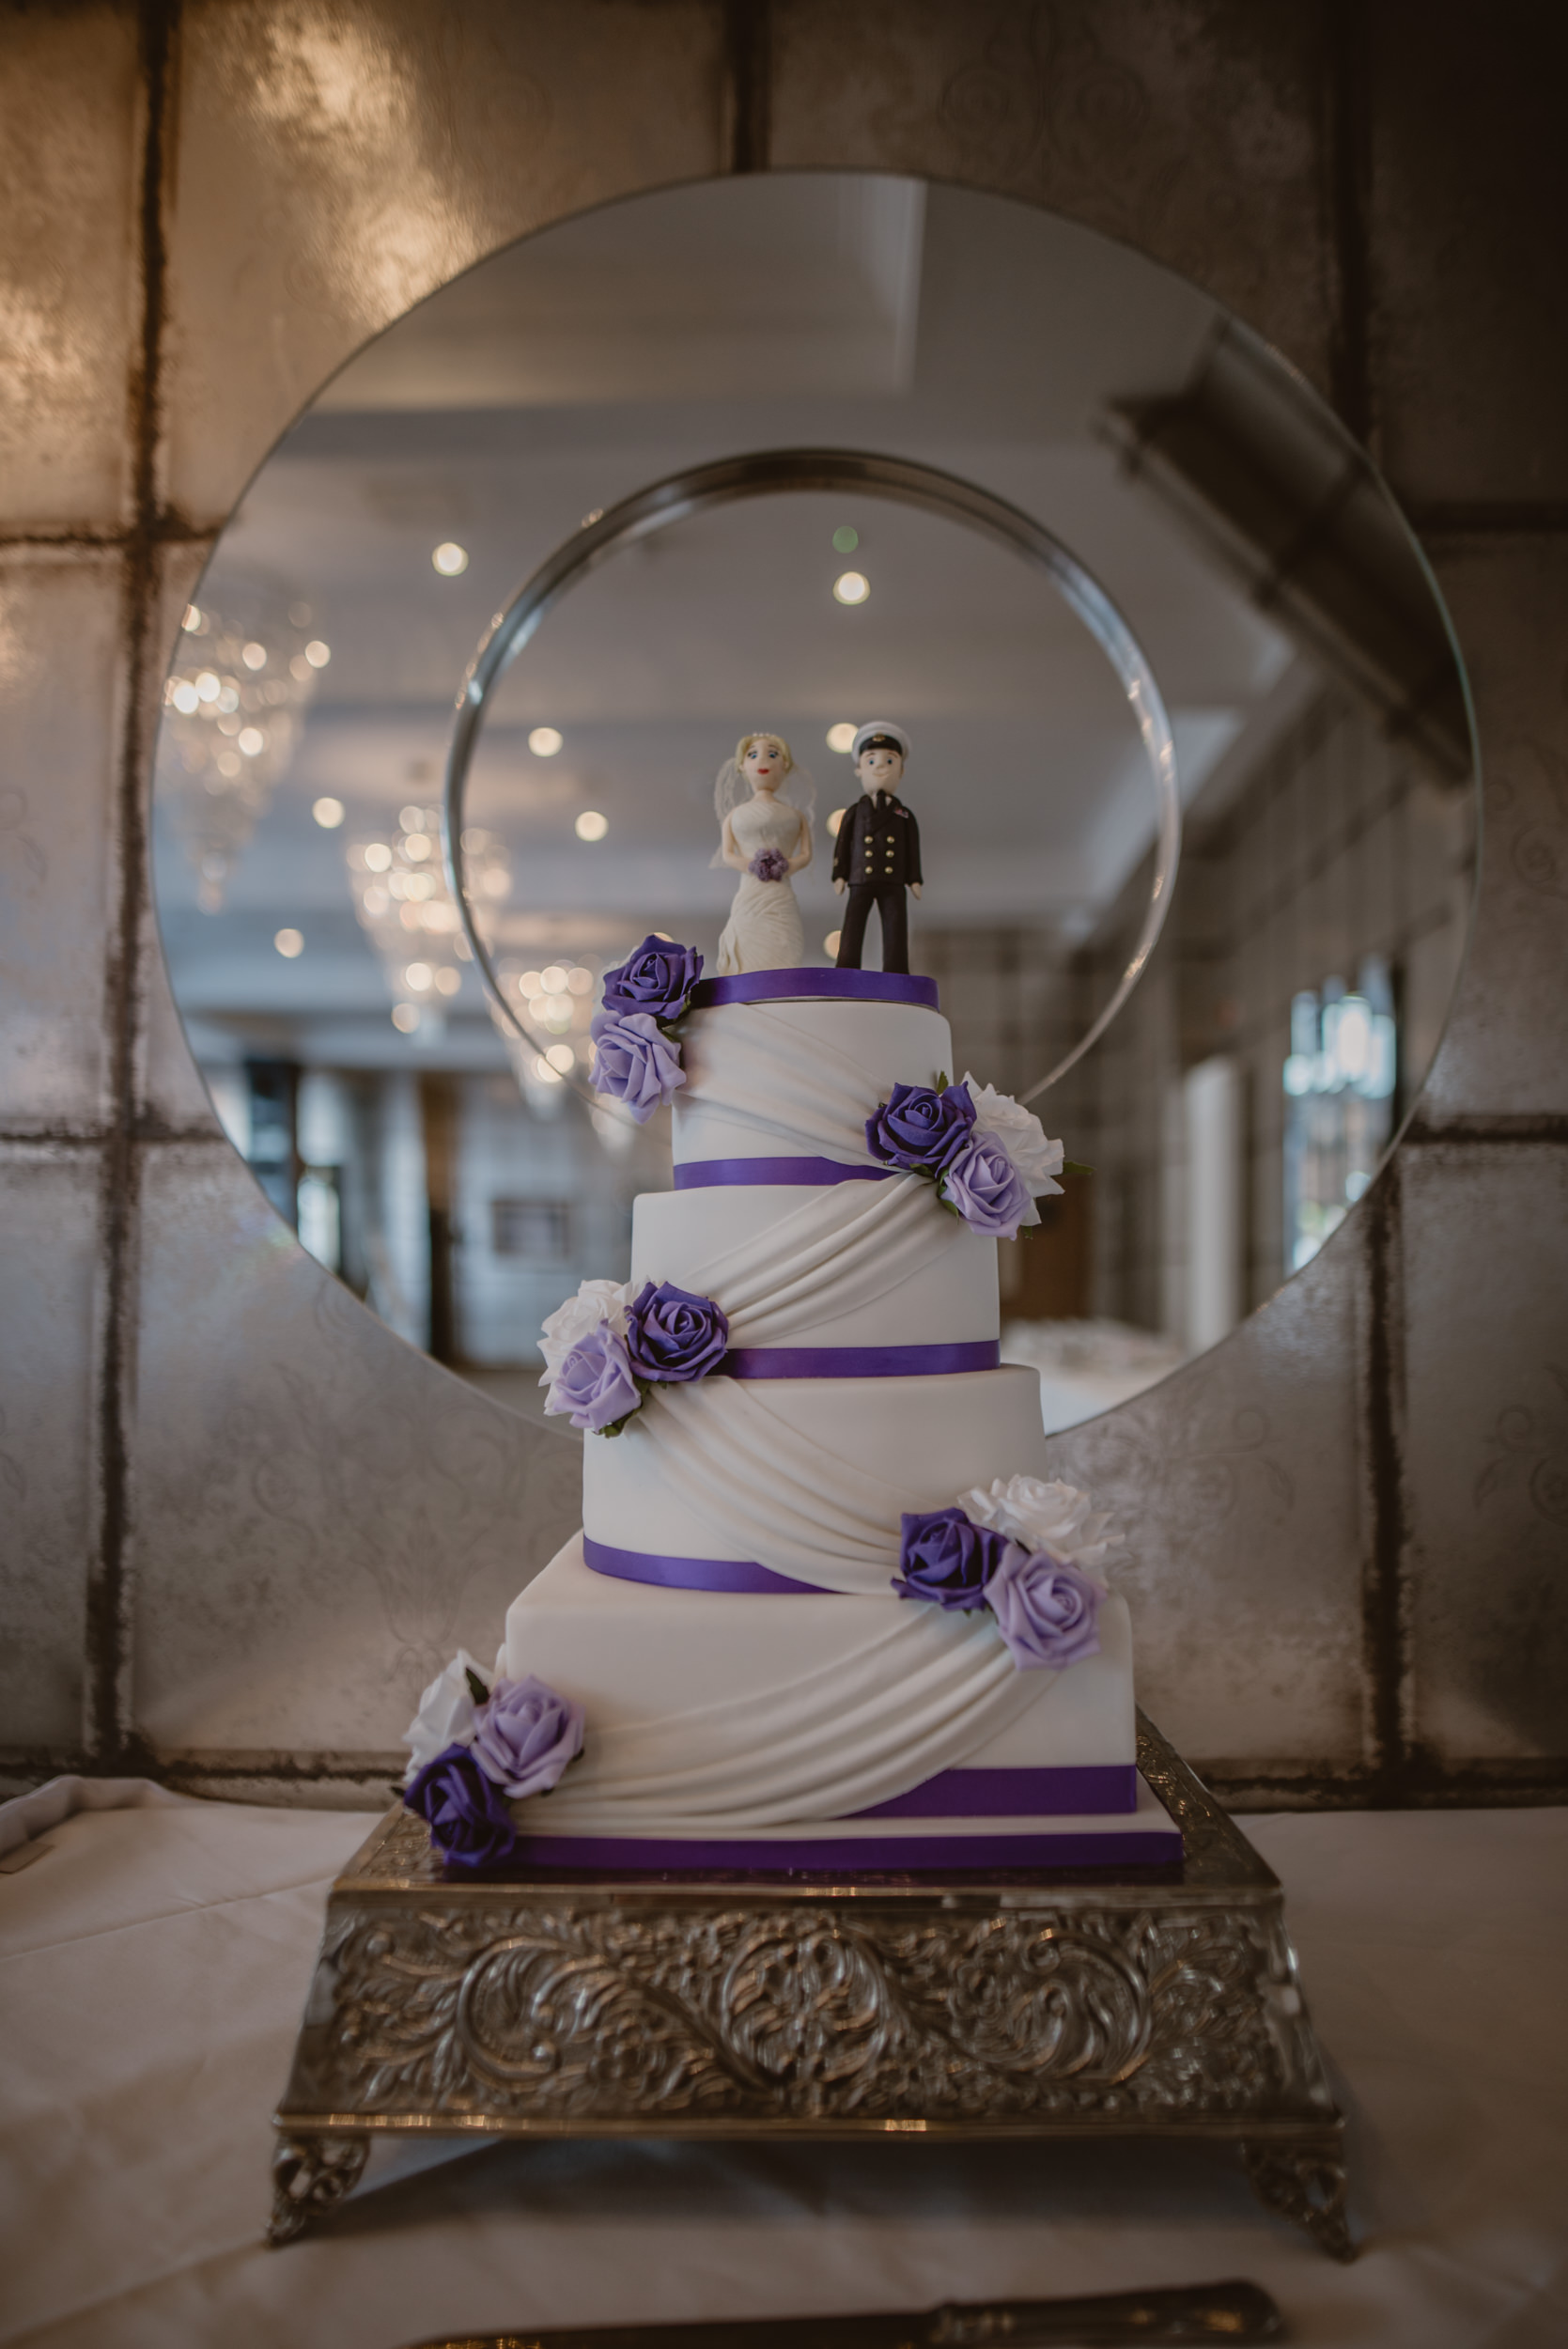 Chantelle-and-Stephen-Old-Thorns-Hotel-Wedding-Liphook-Manu-Mendoza-Wedding-Photography-331.jpg